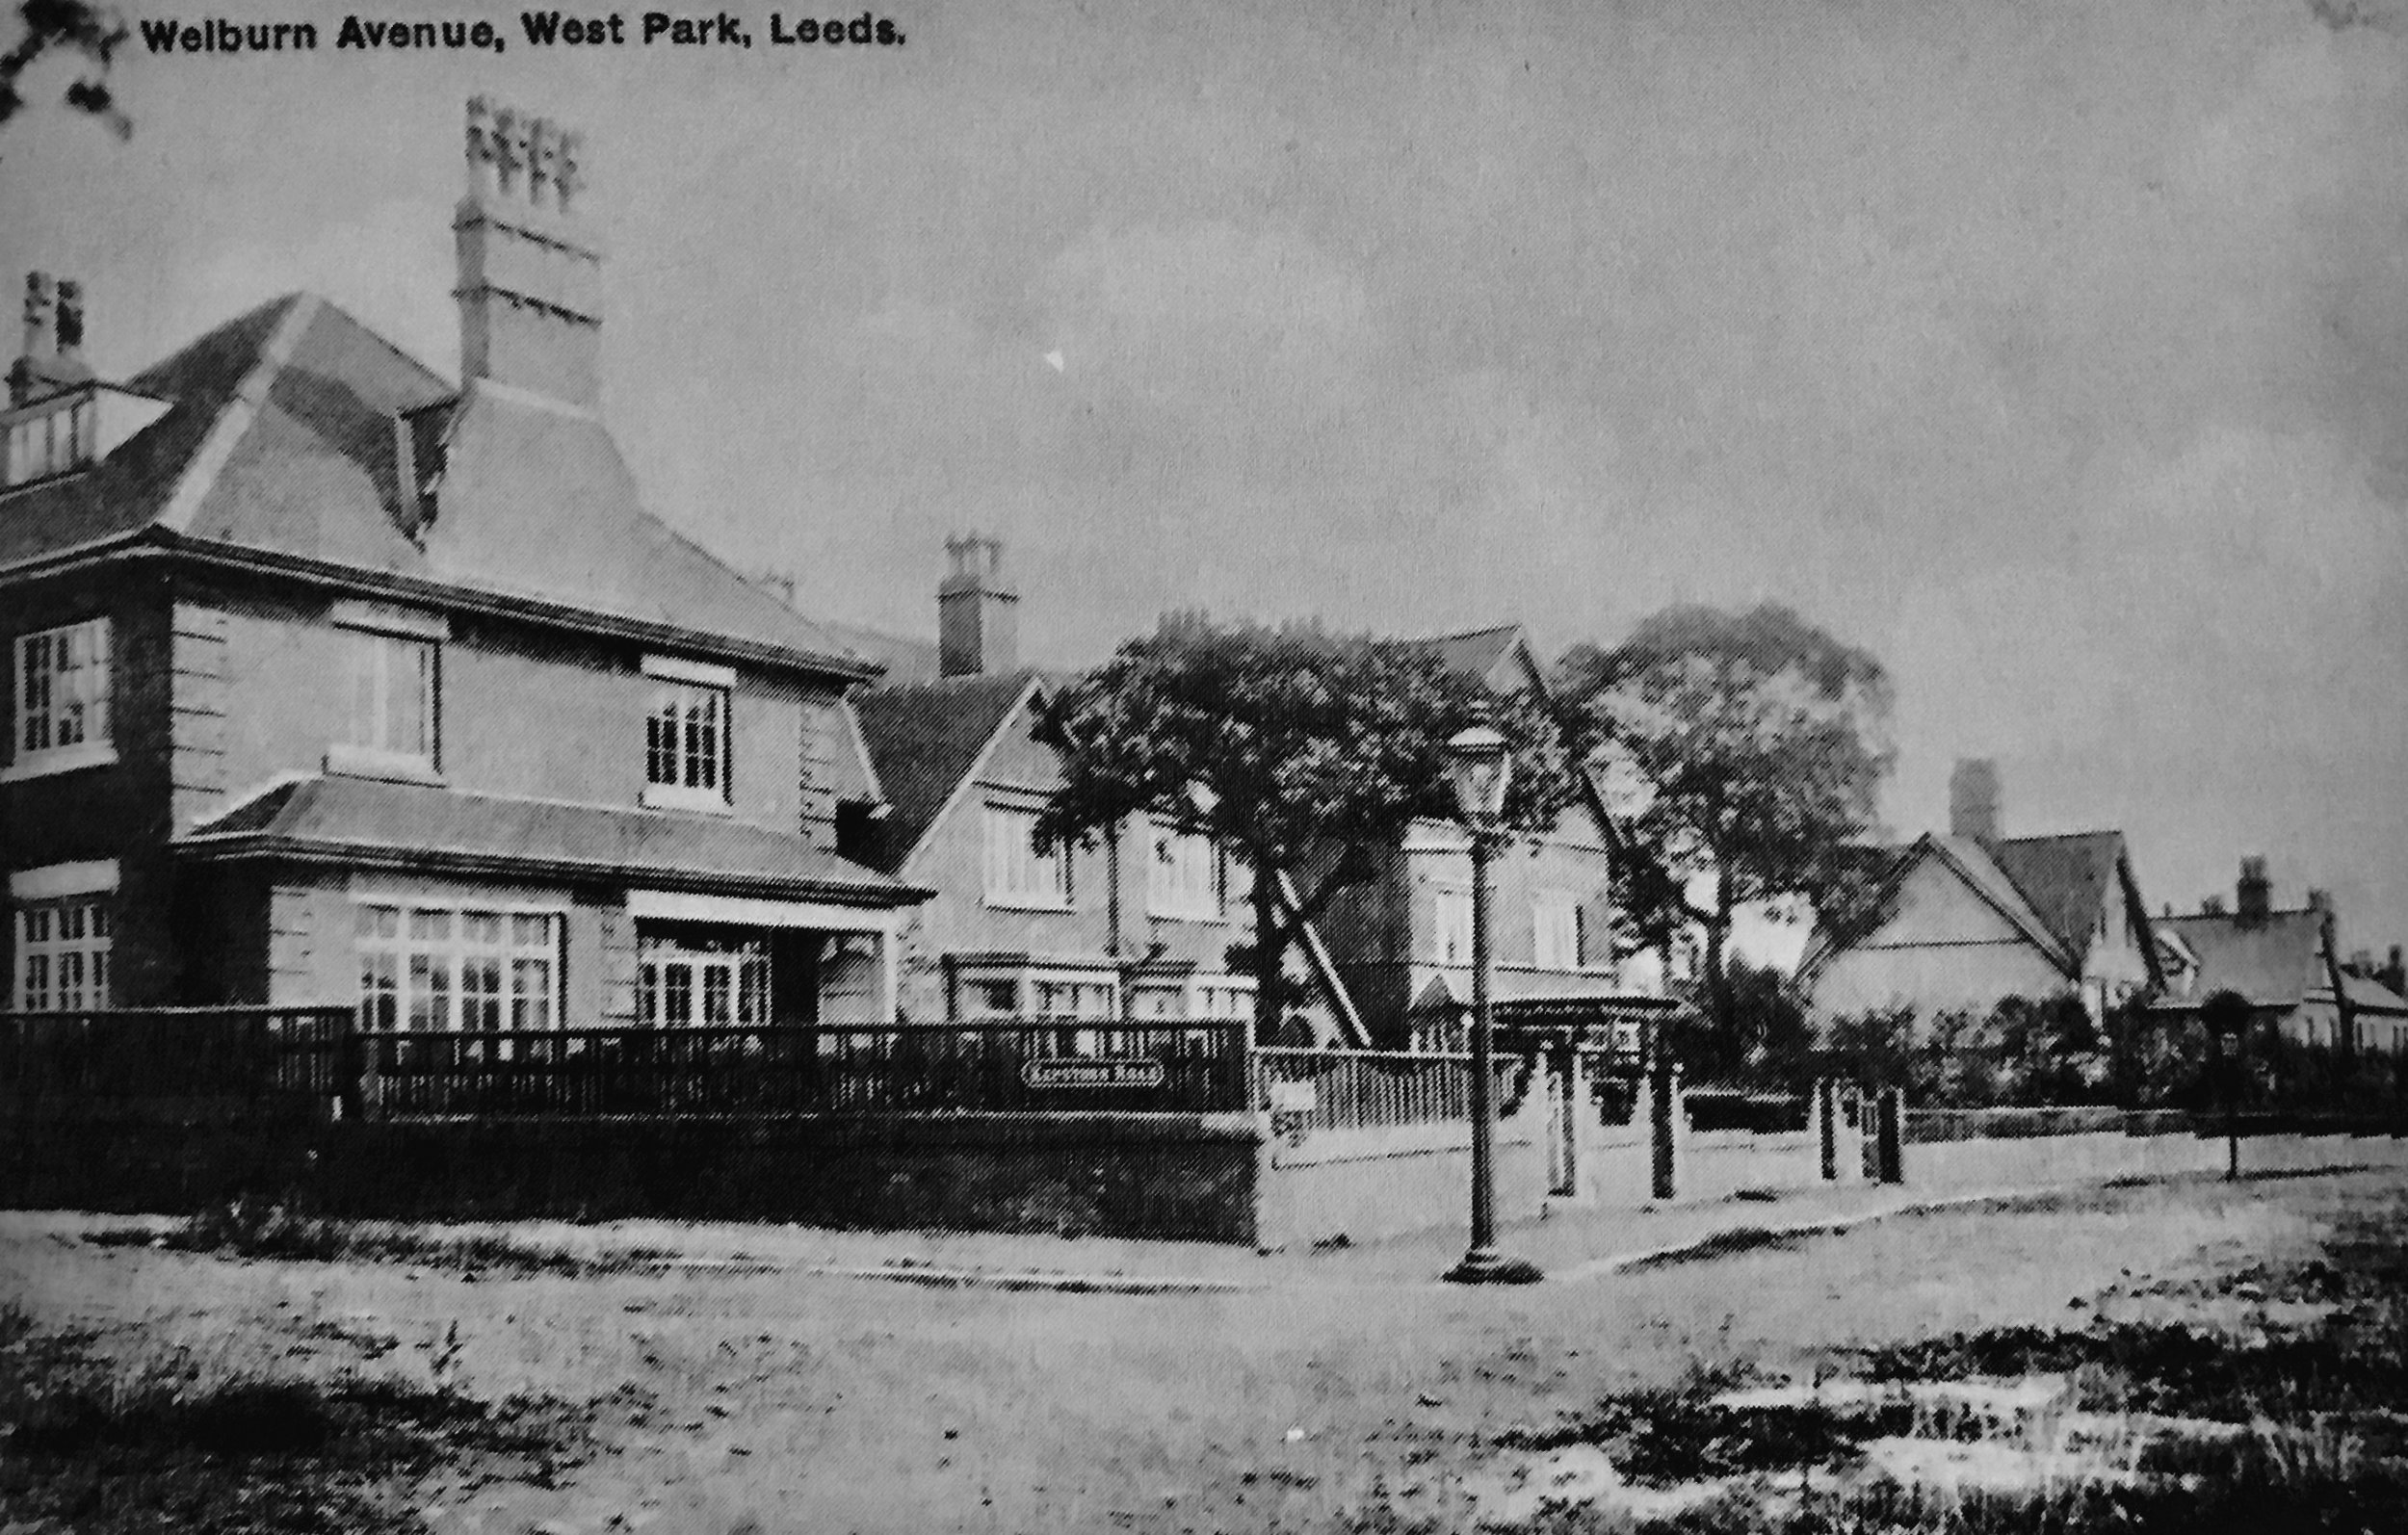 Welburn Avenue